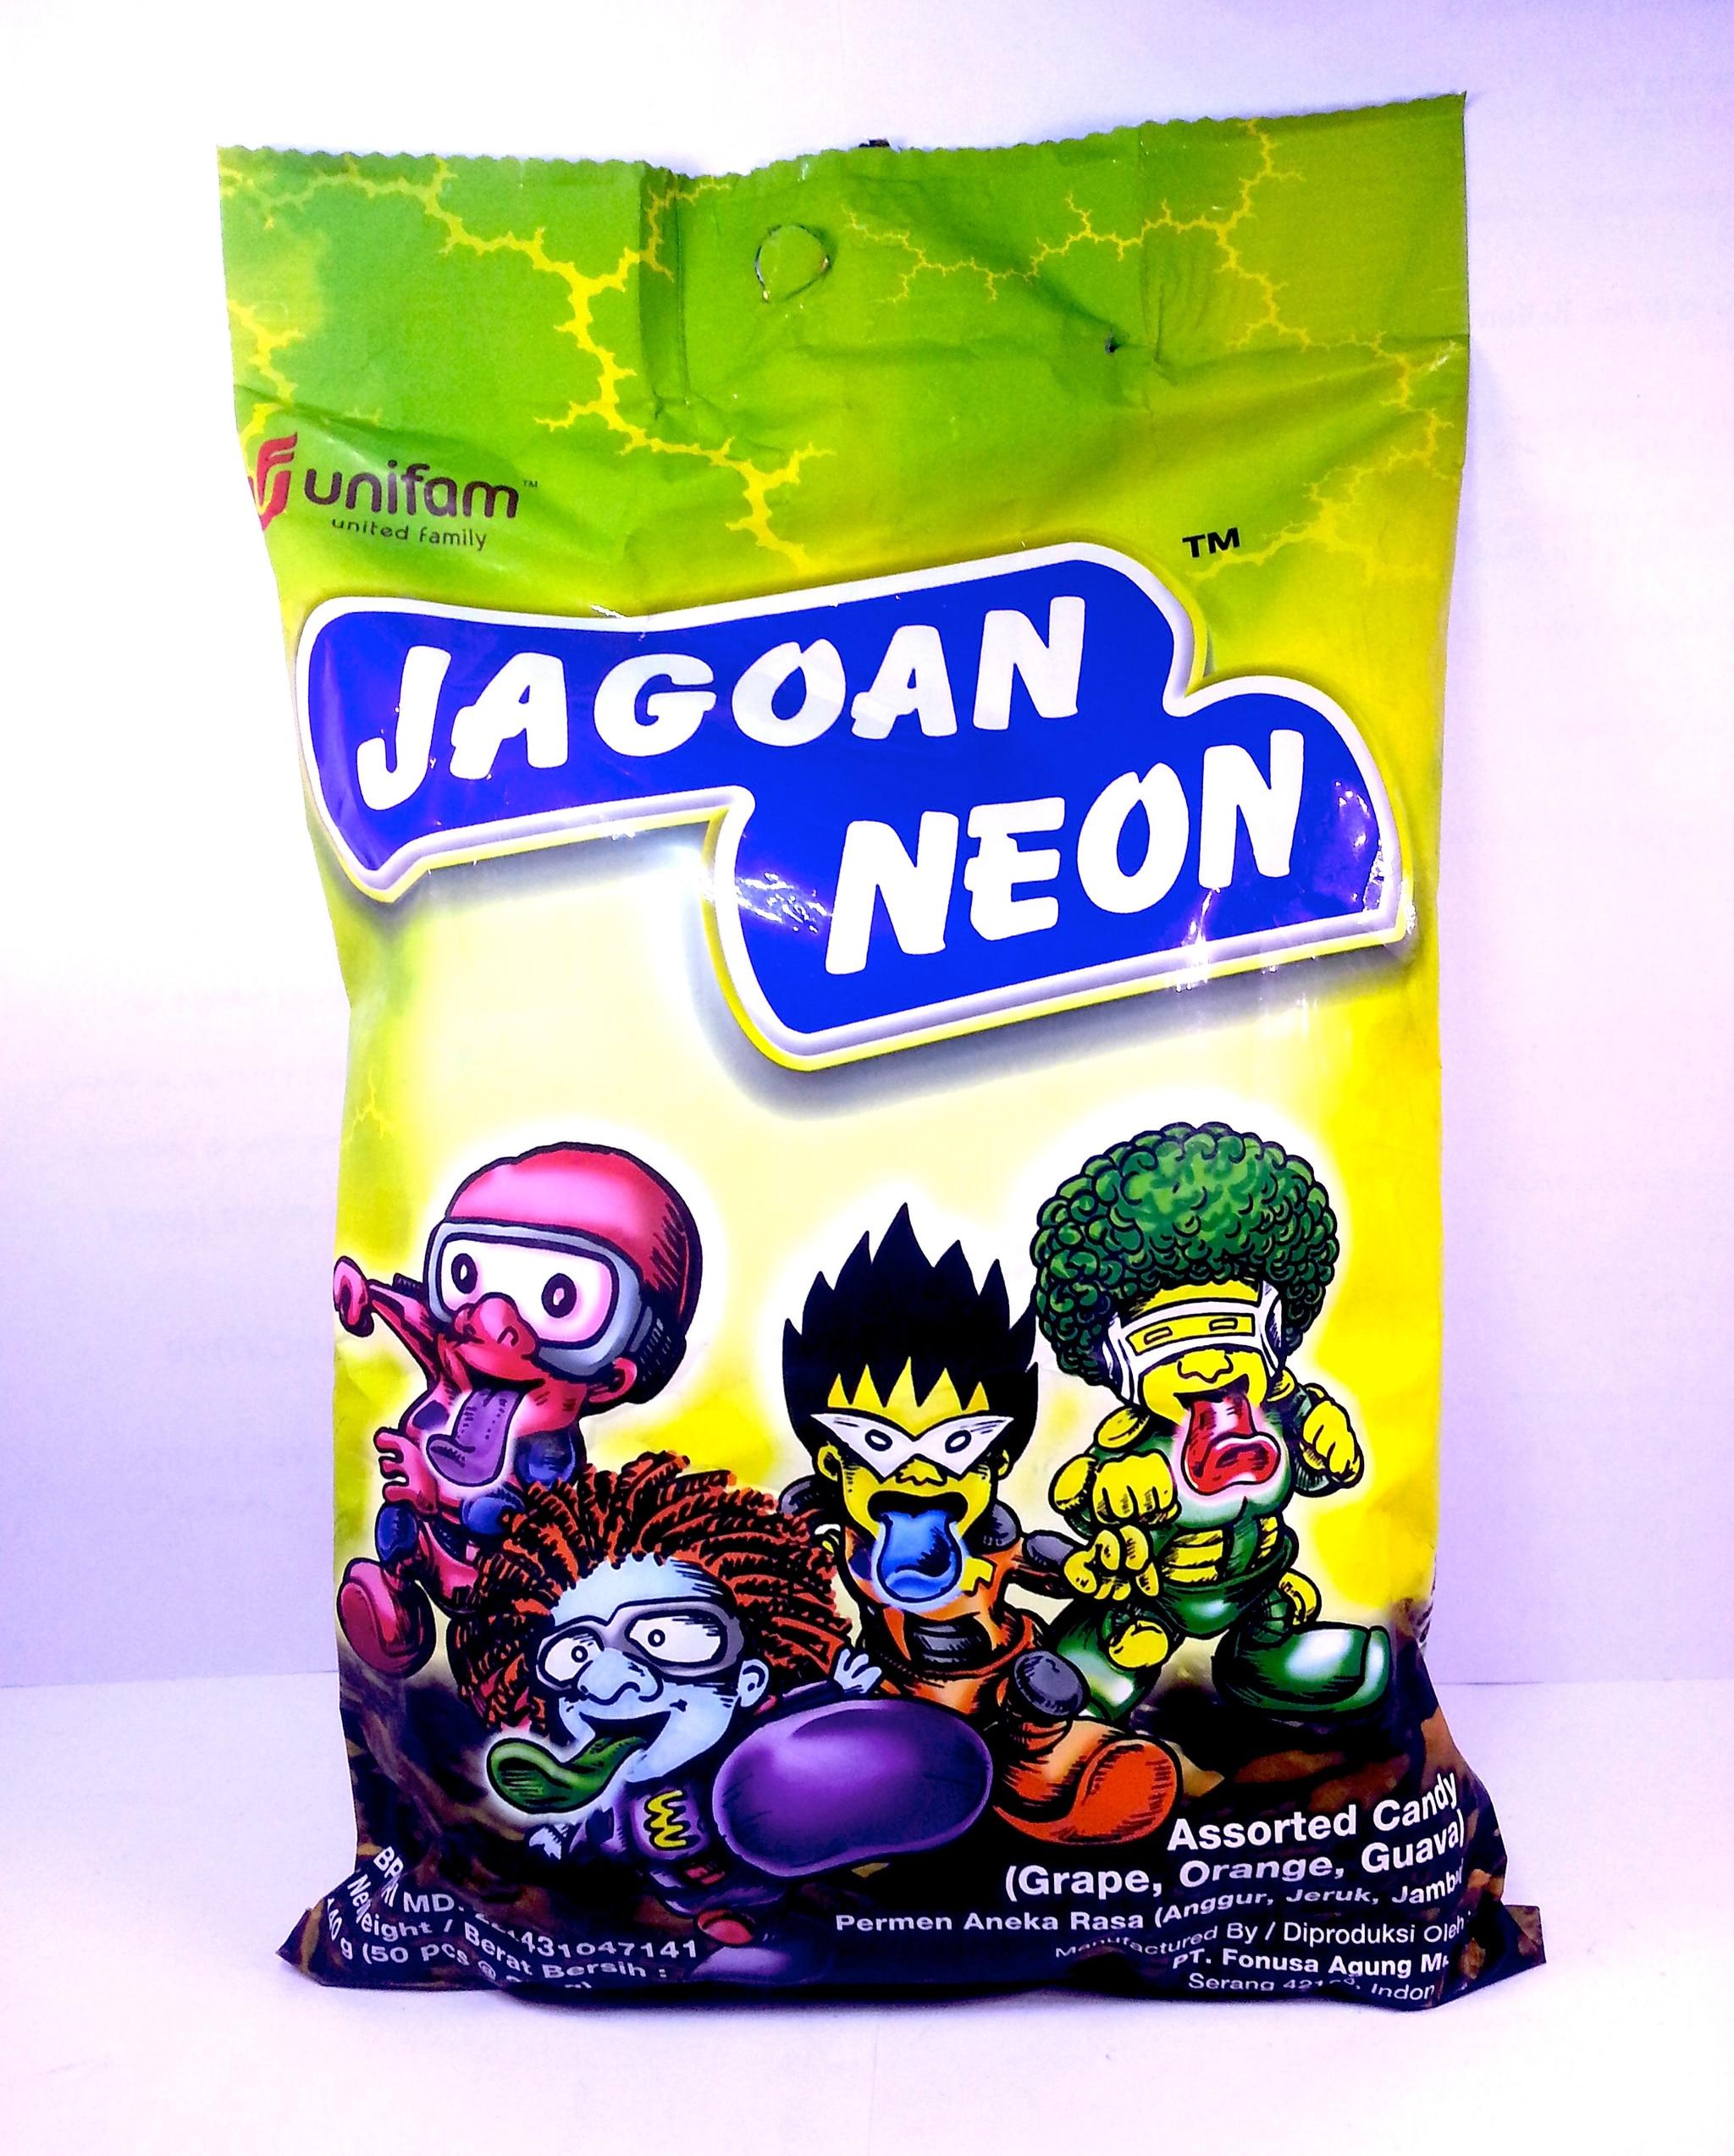 Jual Permen Jagoan Neon Permen Aneka Rasa Assorted Candy happycouple